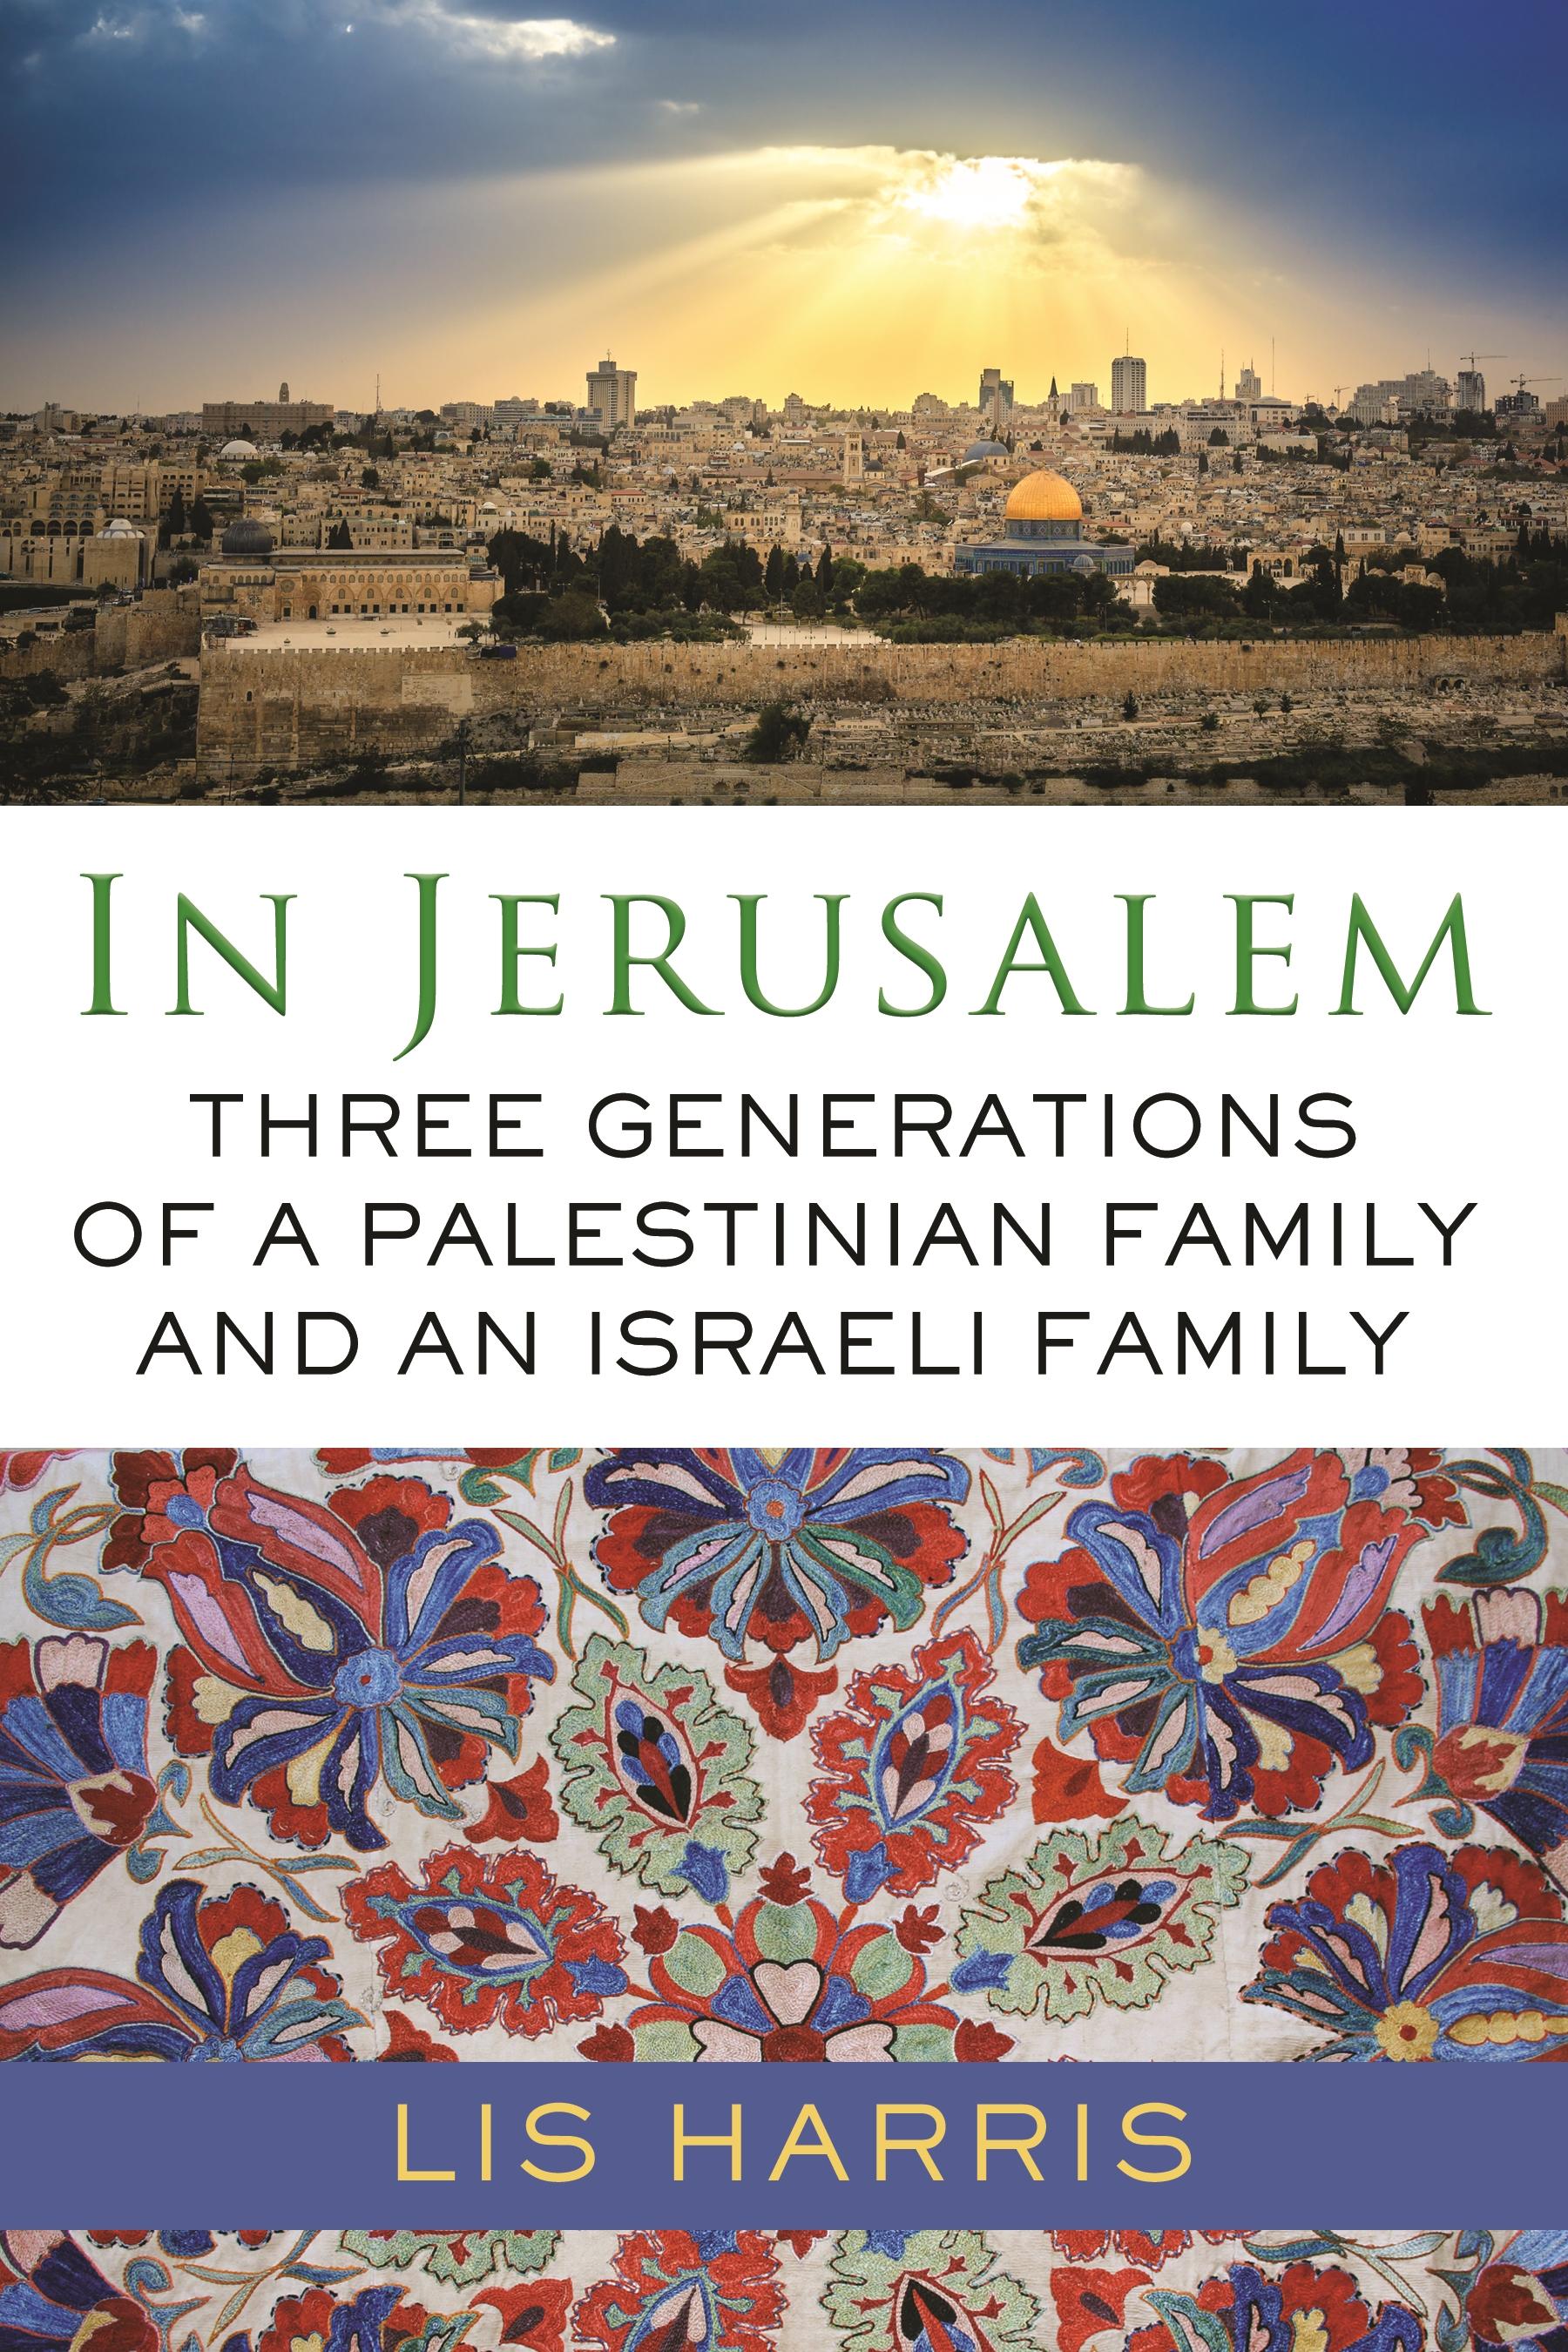 Book Launch: In Jerusalem by Lis Harris